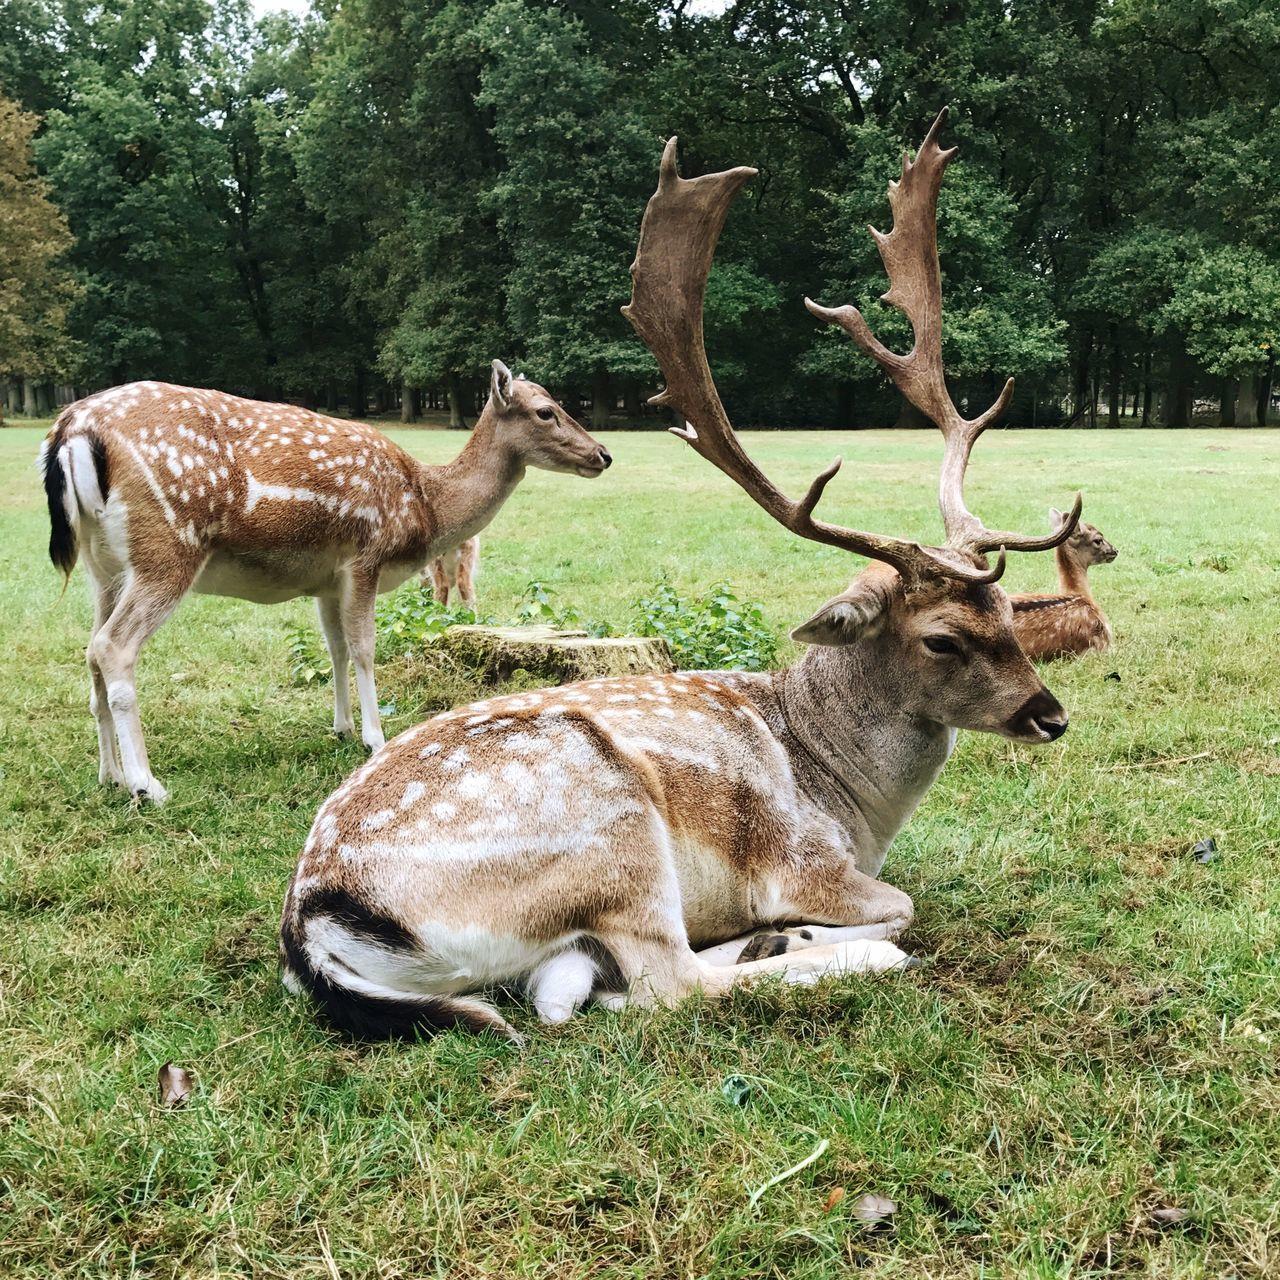 Deer Roe Deer Animals Animal Herd Animal Themes Grass Mammal Nature Day No People Domestic Animals